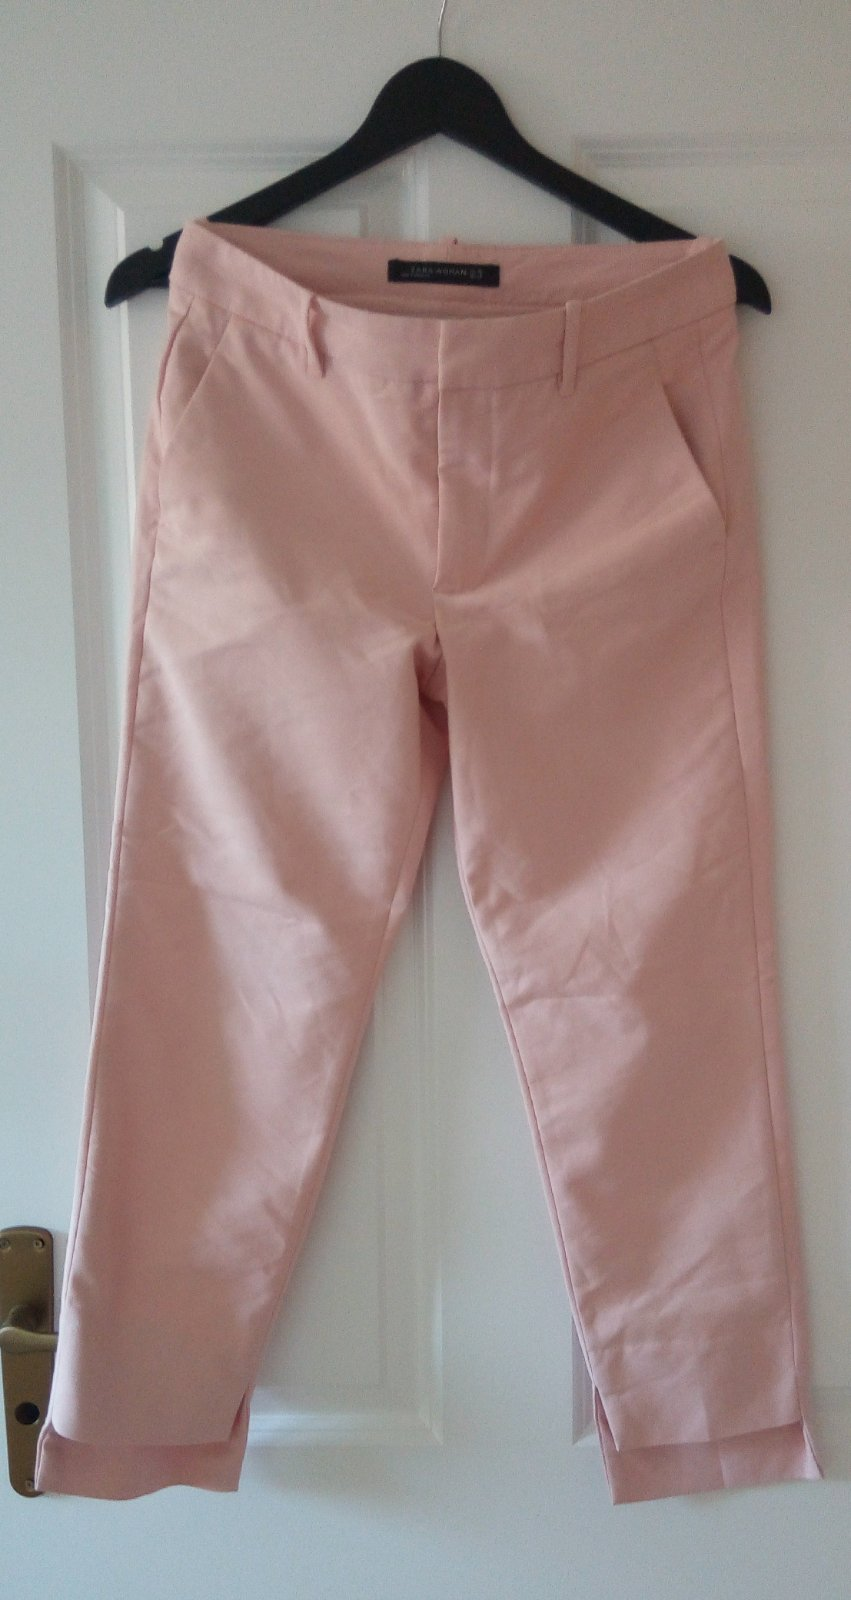 Bledoružové nohavice Zara S - Obrázok č. 3